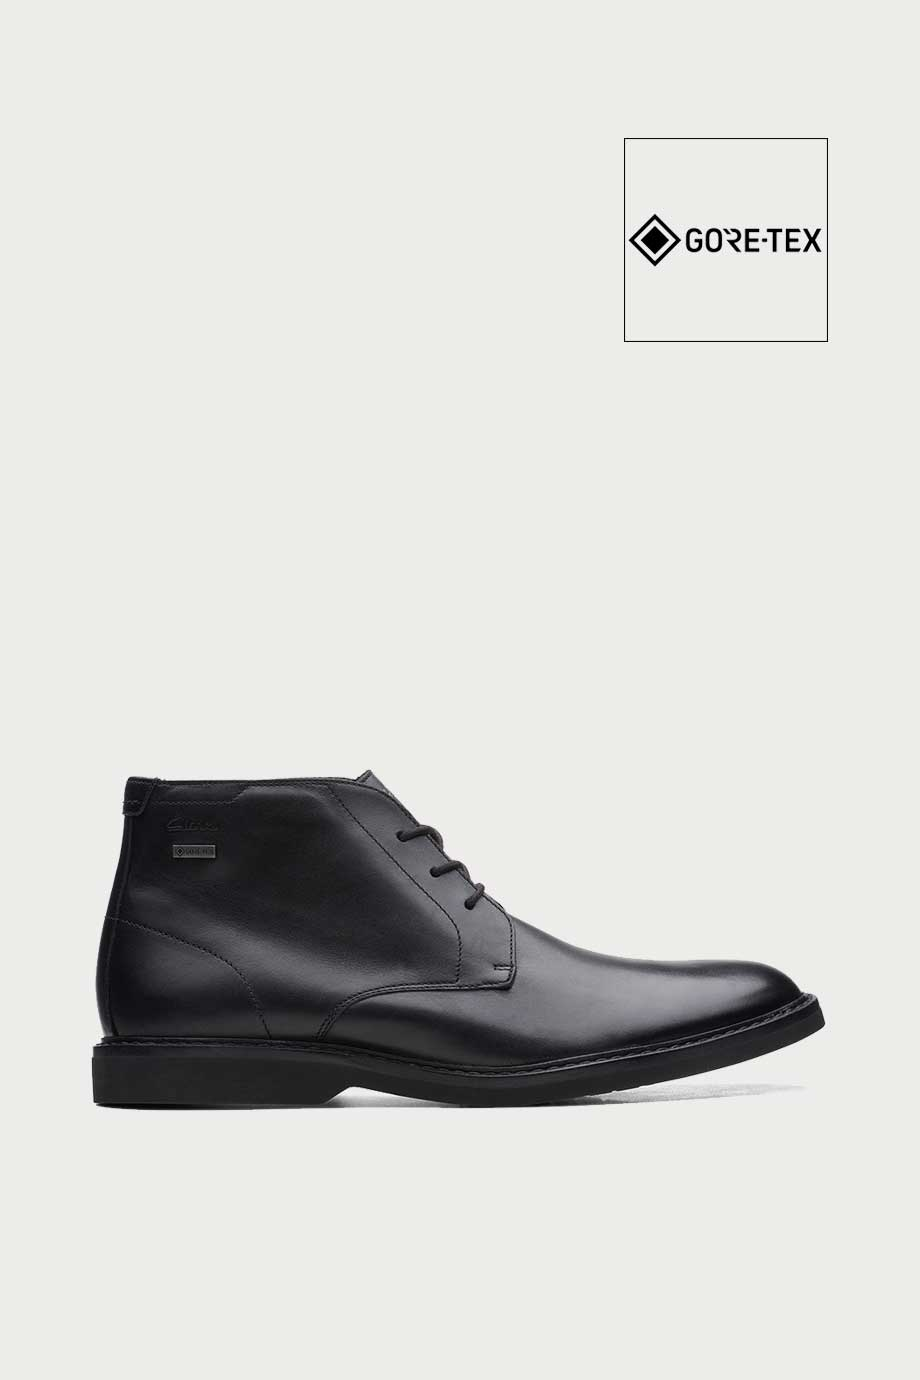 spiridoula metheniti shoes xalkida p AtticusLTHiGTX black leather clarks